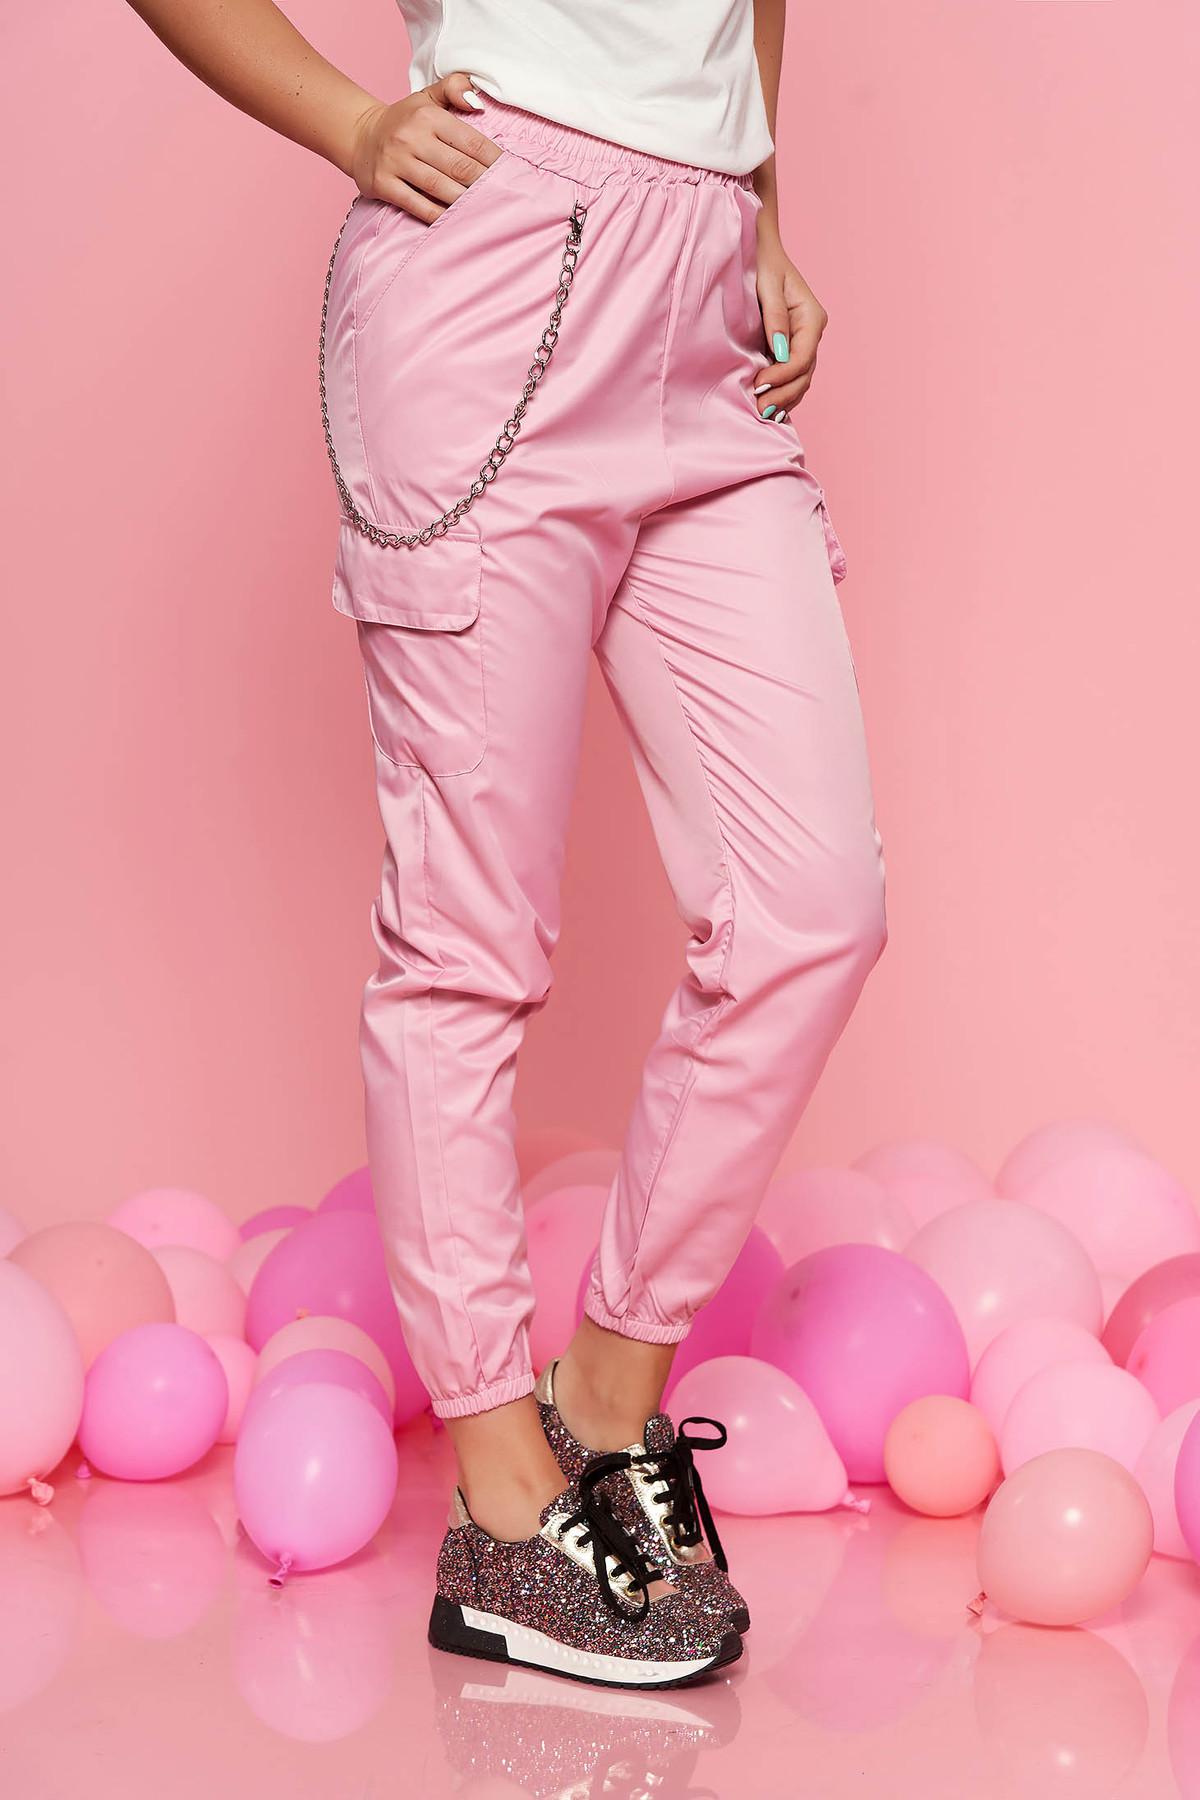 Pantaloni SunShine roz casual cu talie medie cu elastic in talie lantisor detasabil